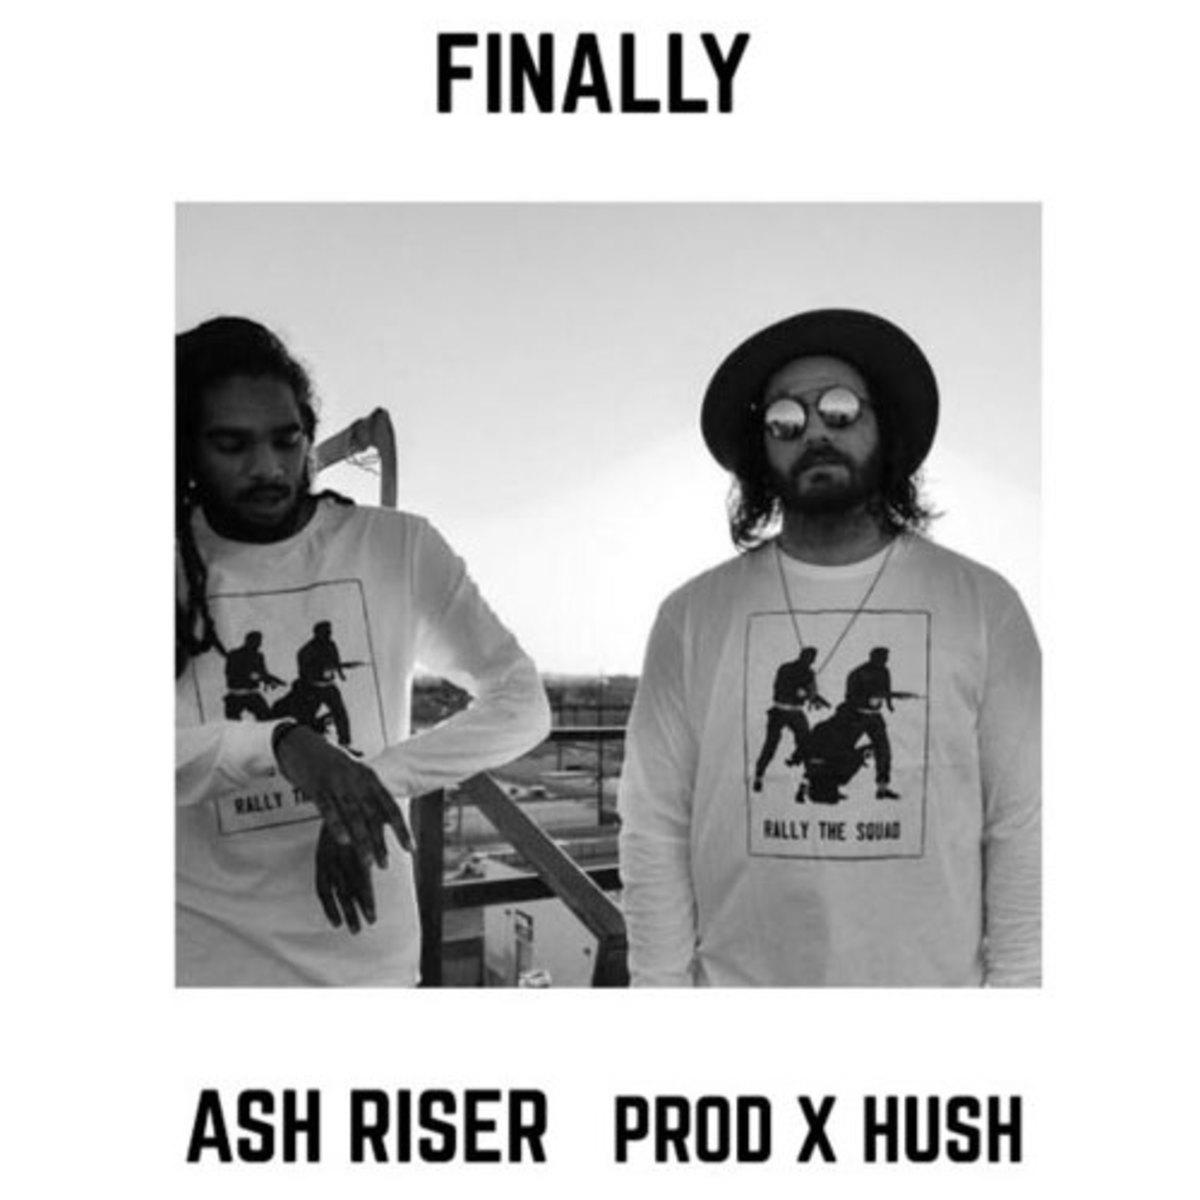 ash-riser-finally.jpg